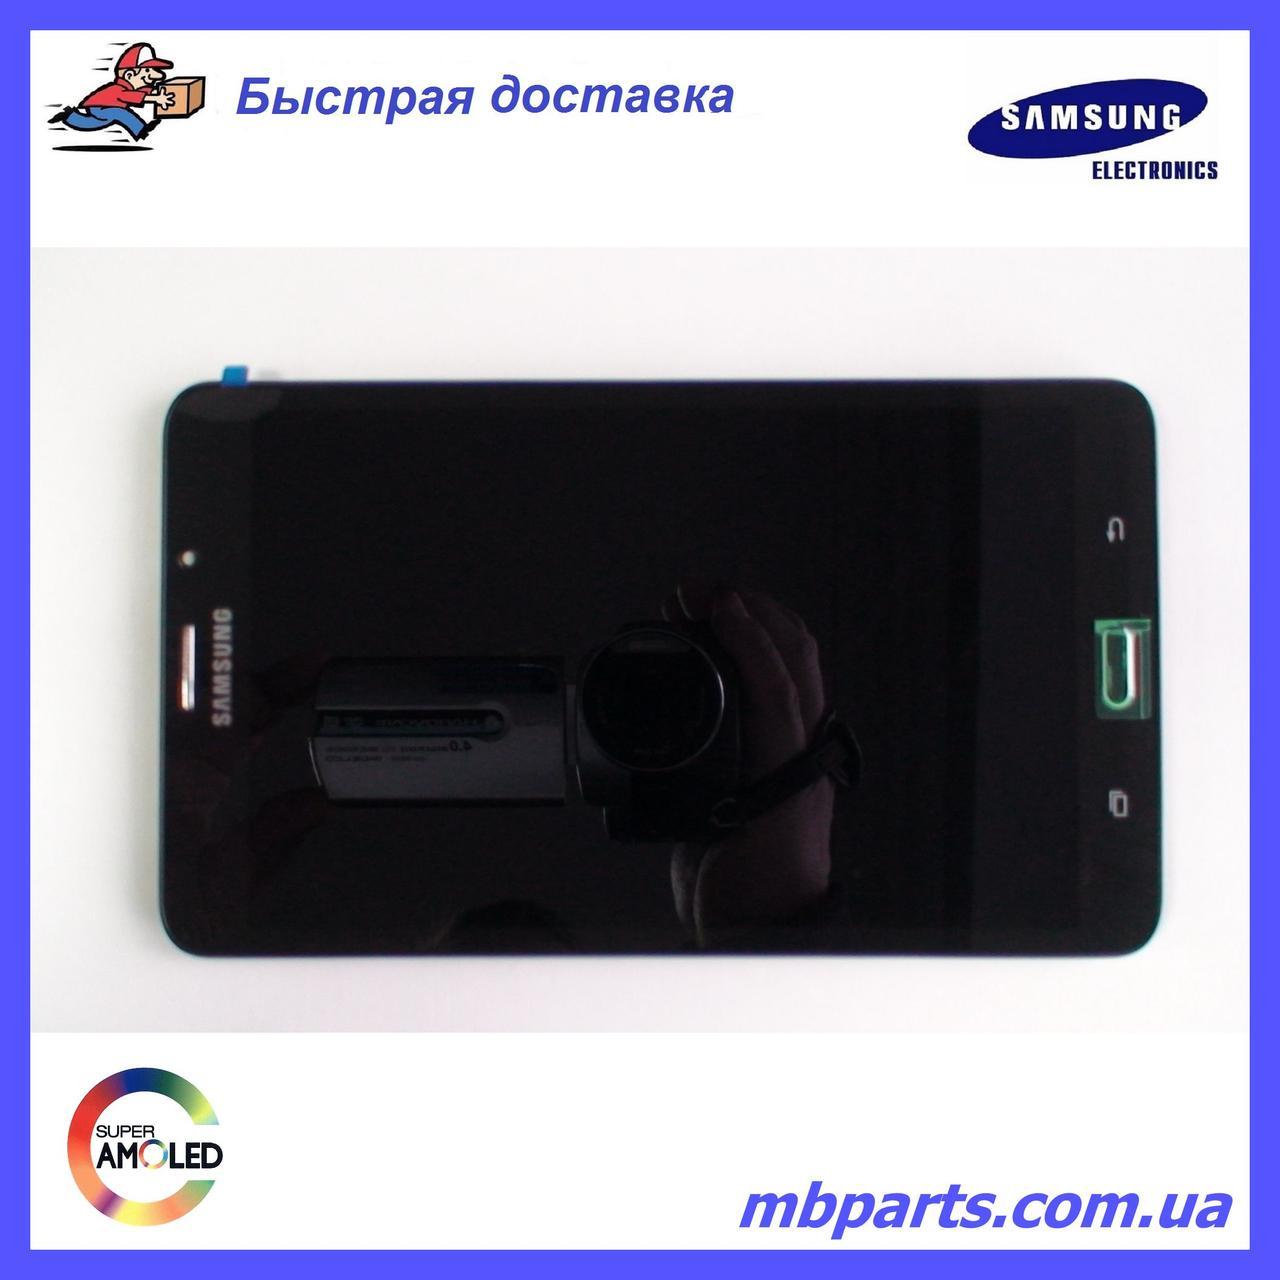 Дисплей с сенсором Samsung T280/T285 Galaxy Tab A 7.0 Black, GH97-18756A оригинал!